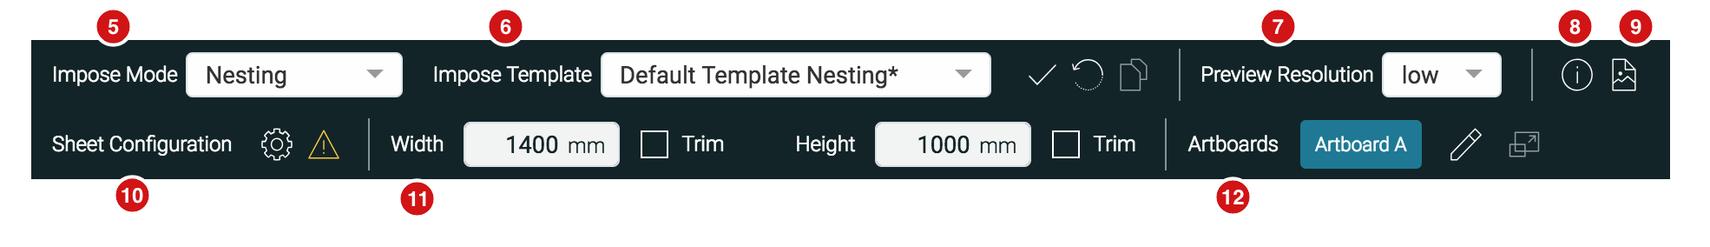 Impose Editor Header redesign 1.7.2